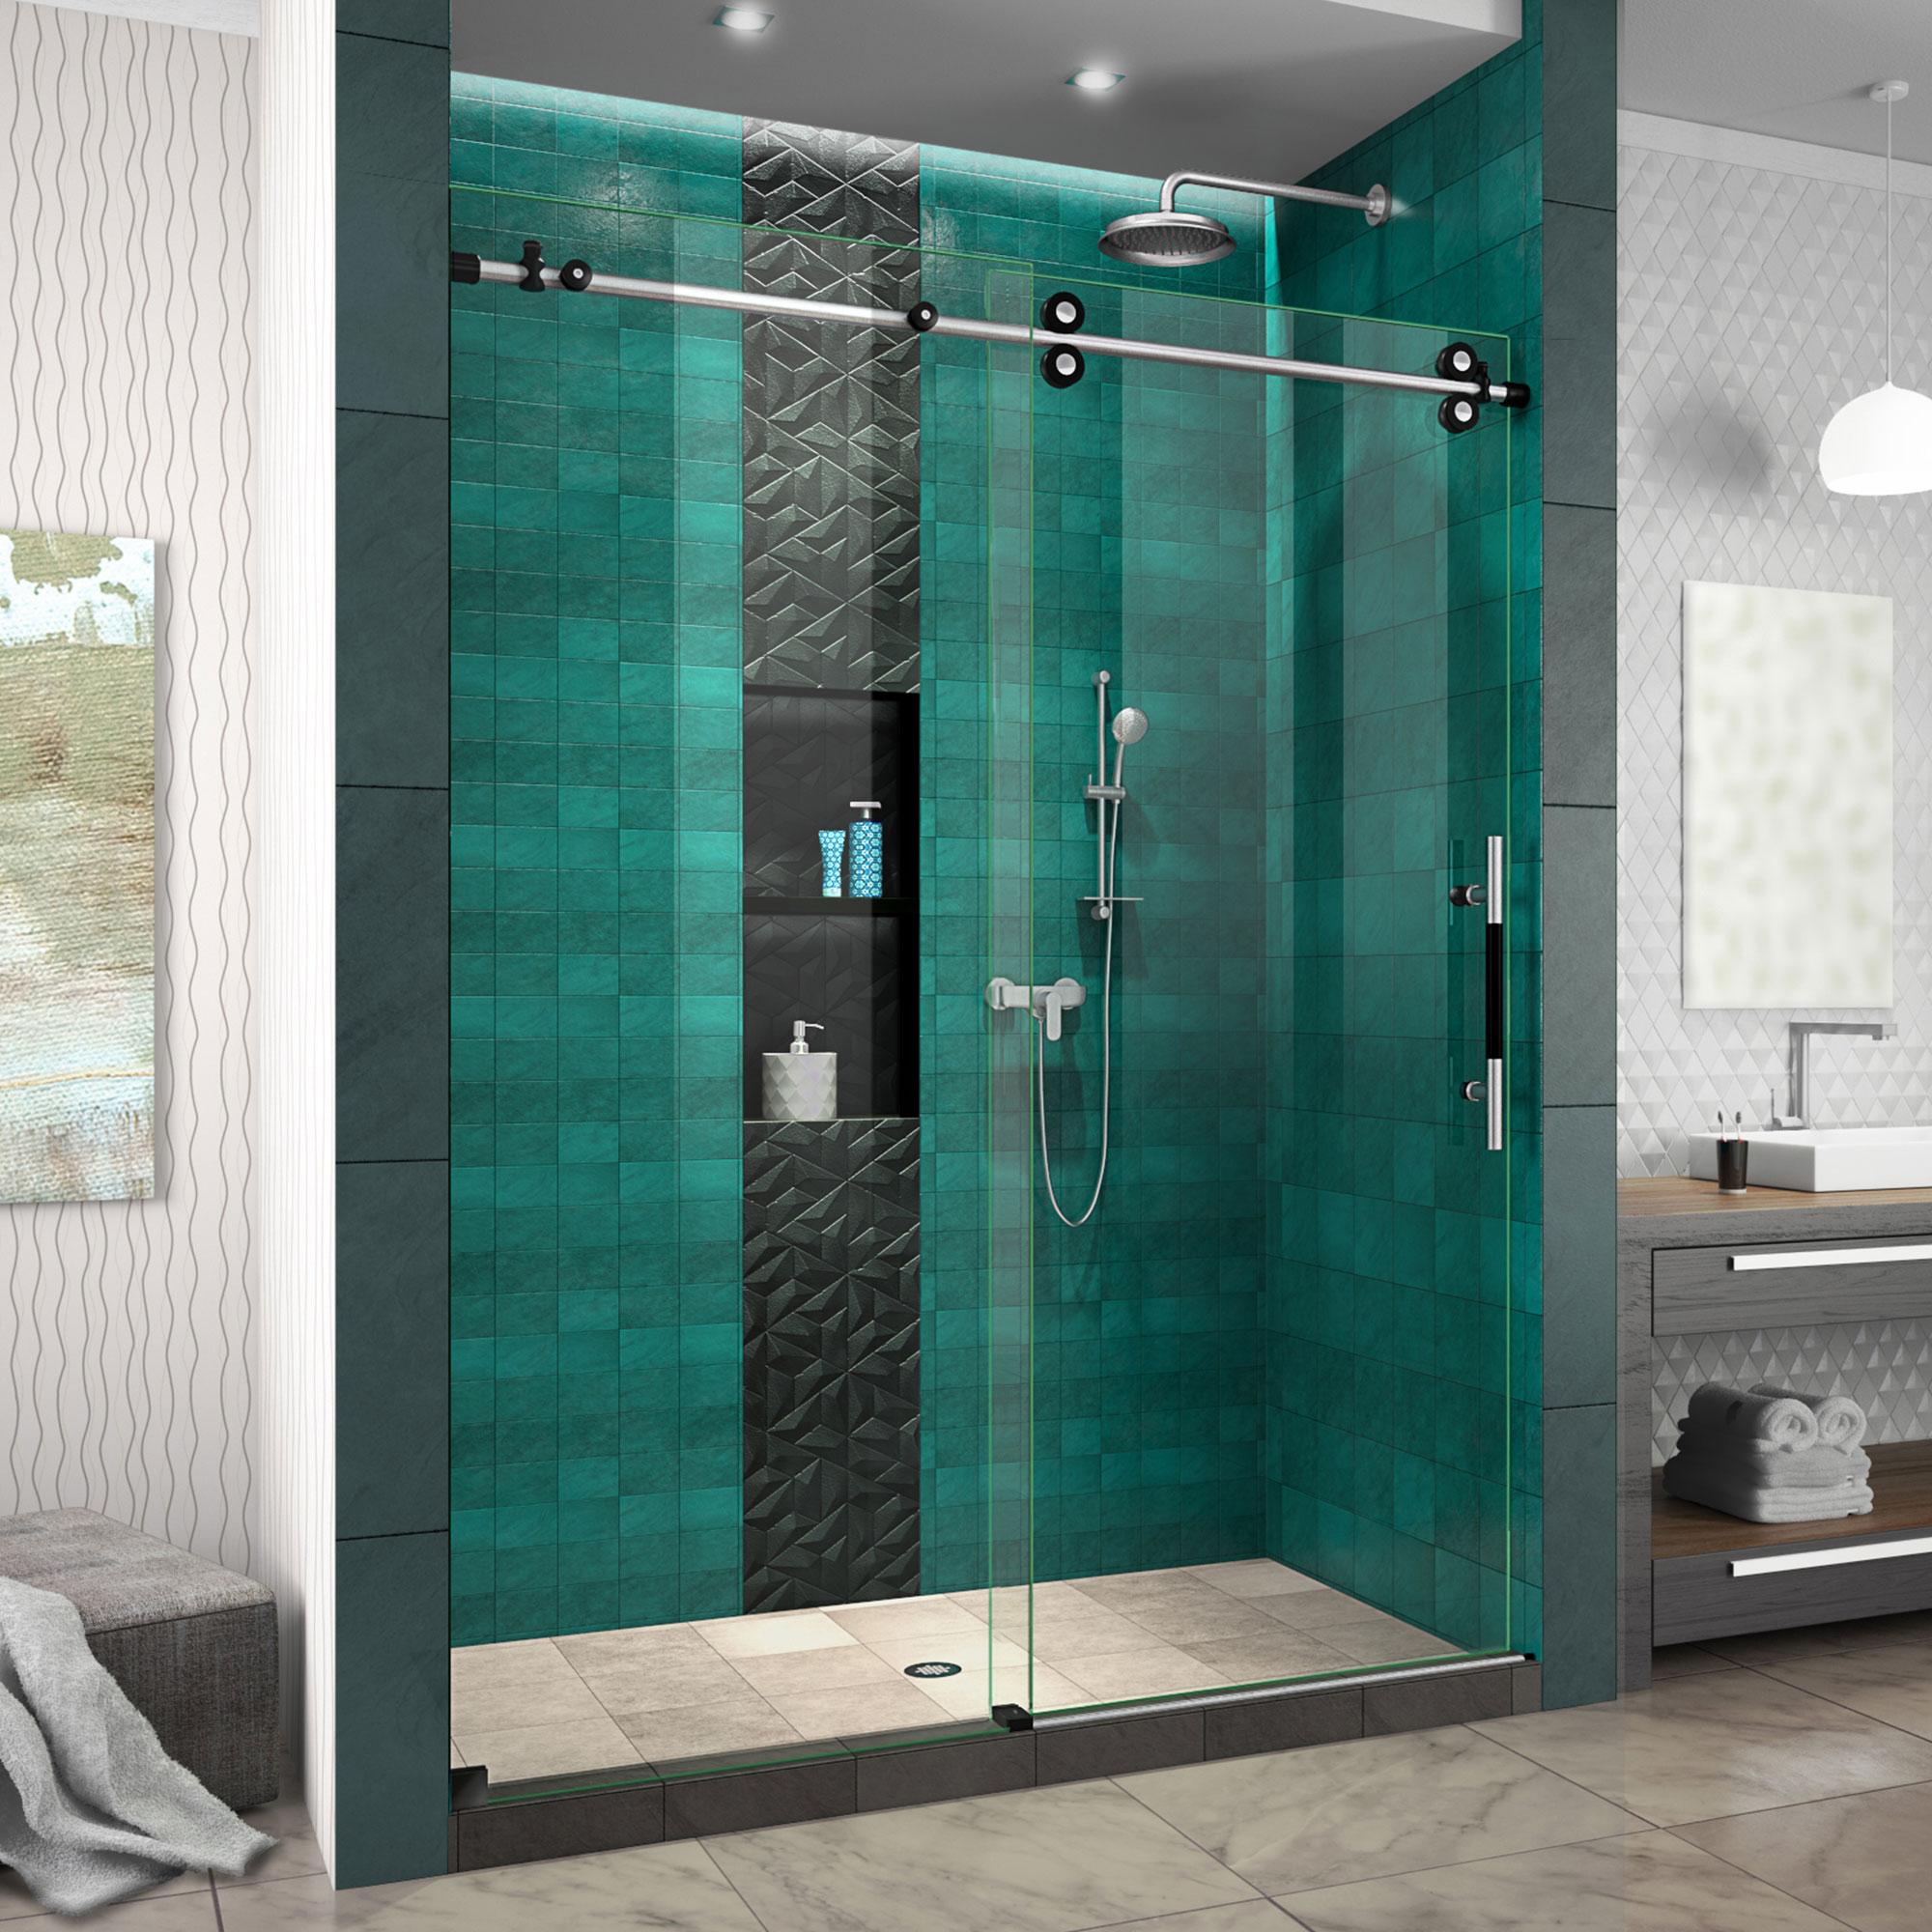 Dreamline Shdr61607620 Enigma Xo 56 60 W X 76 H Inch Frameless Clear Glass Sliding Shower Door